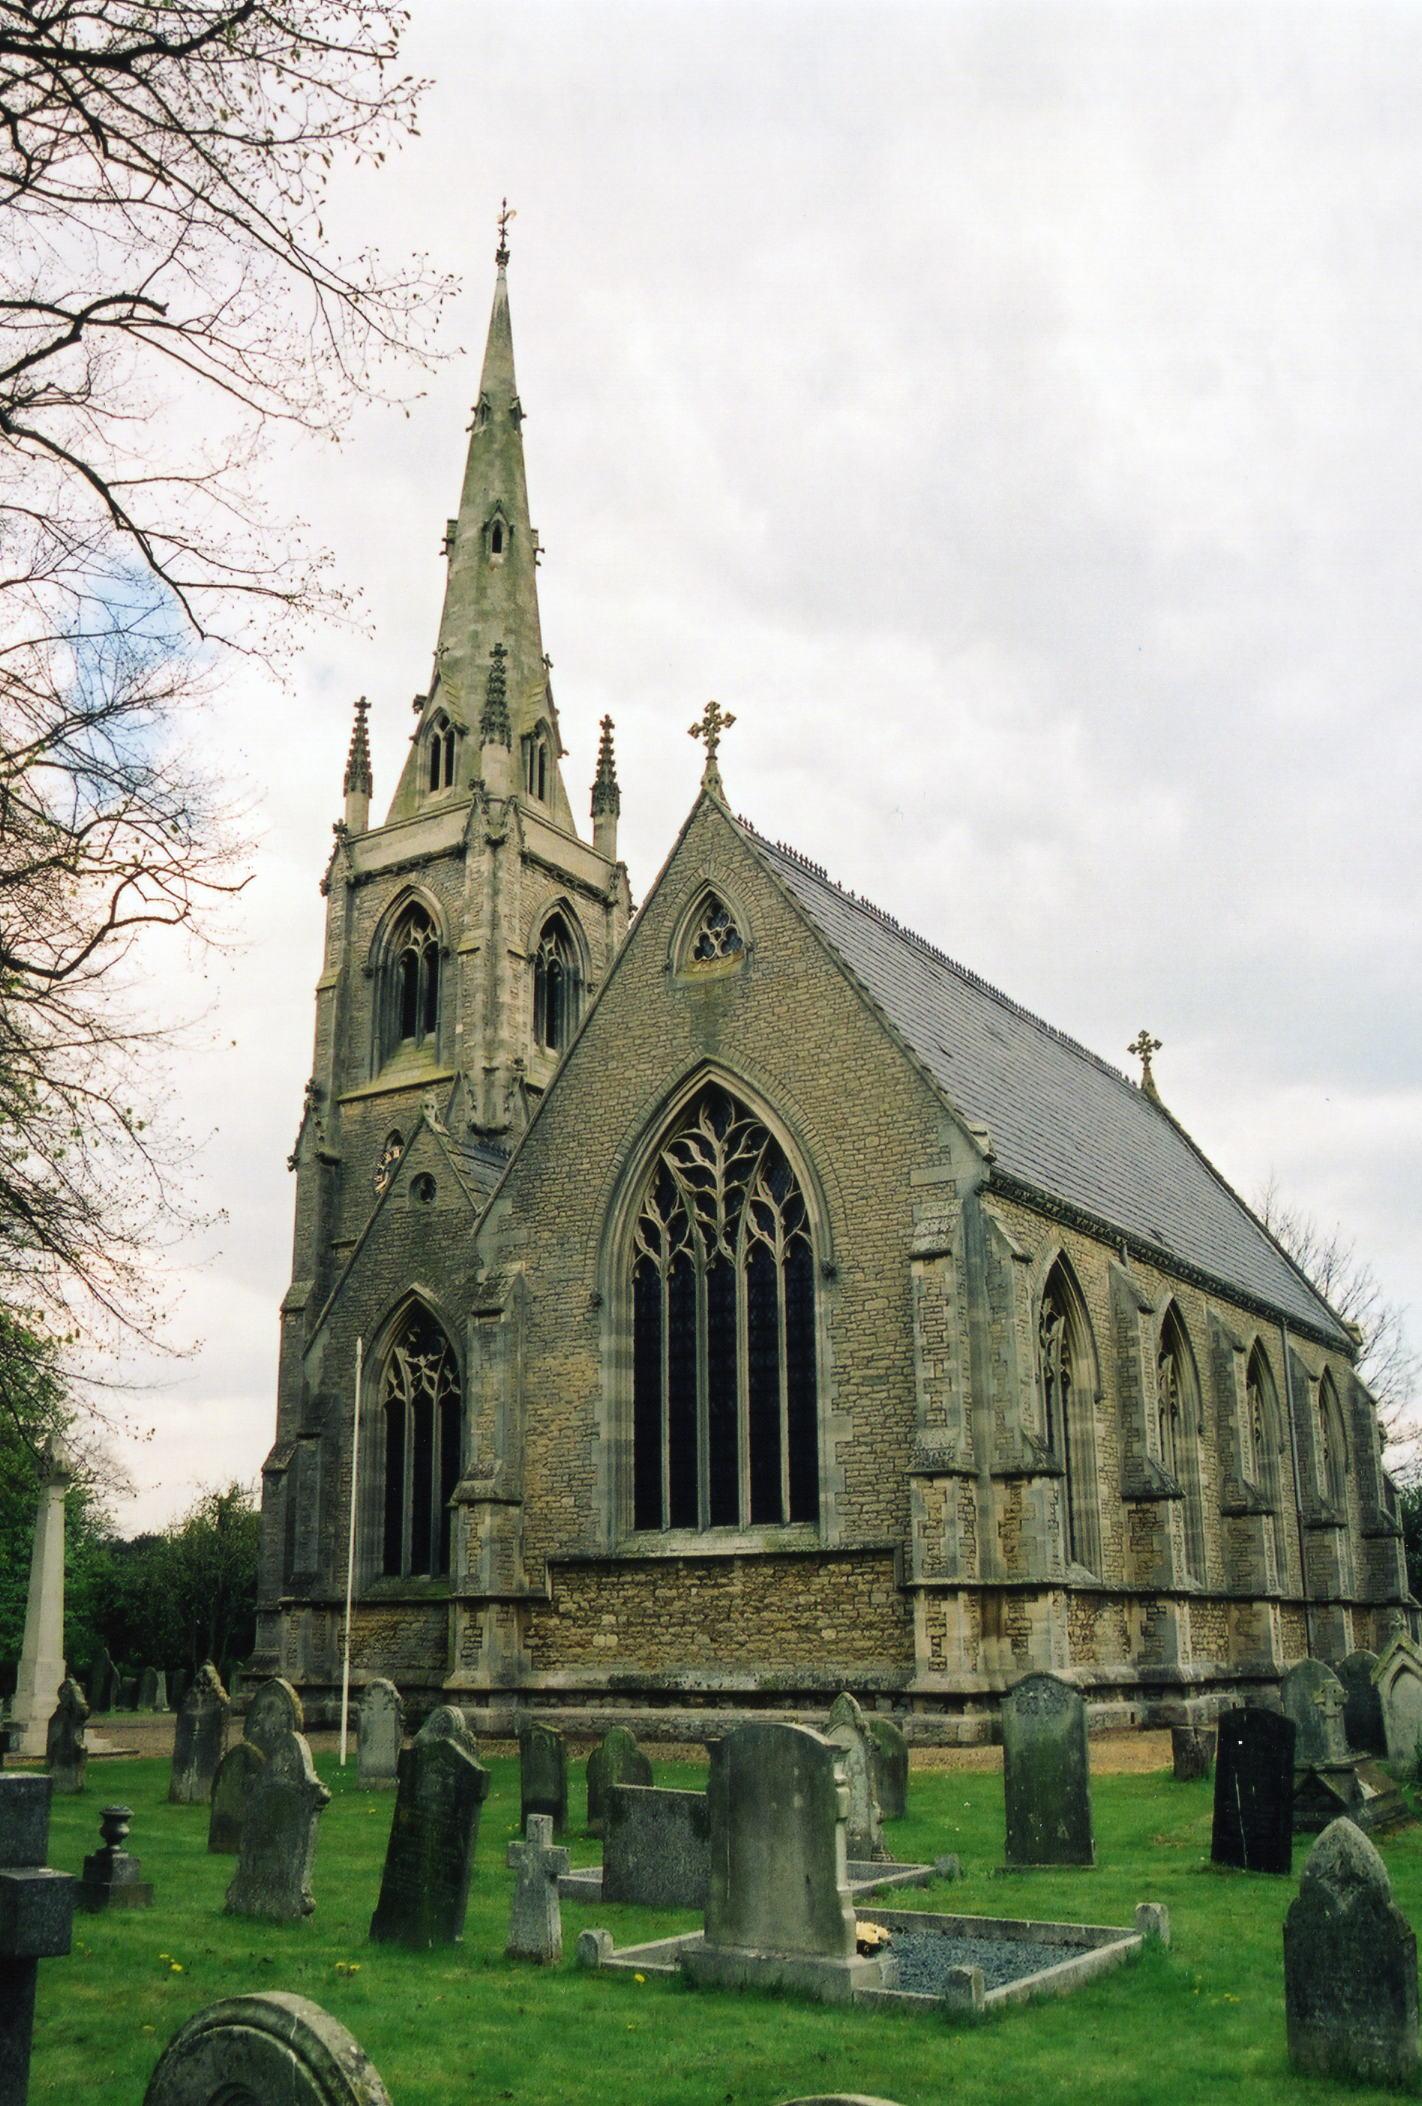 Deeping St. Nicholas Church